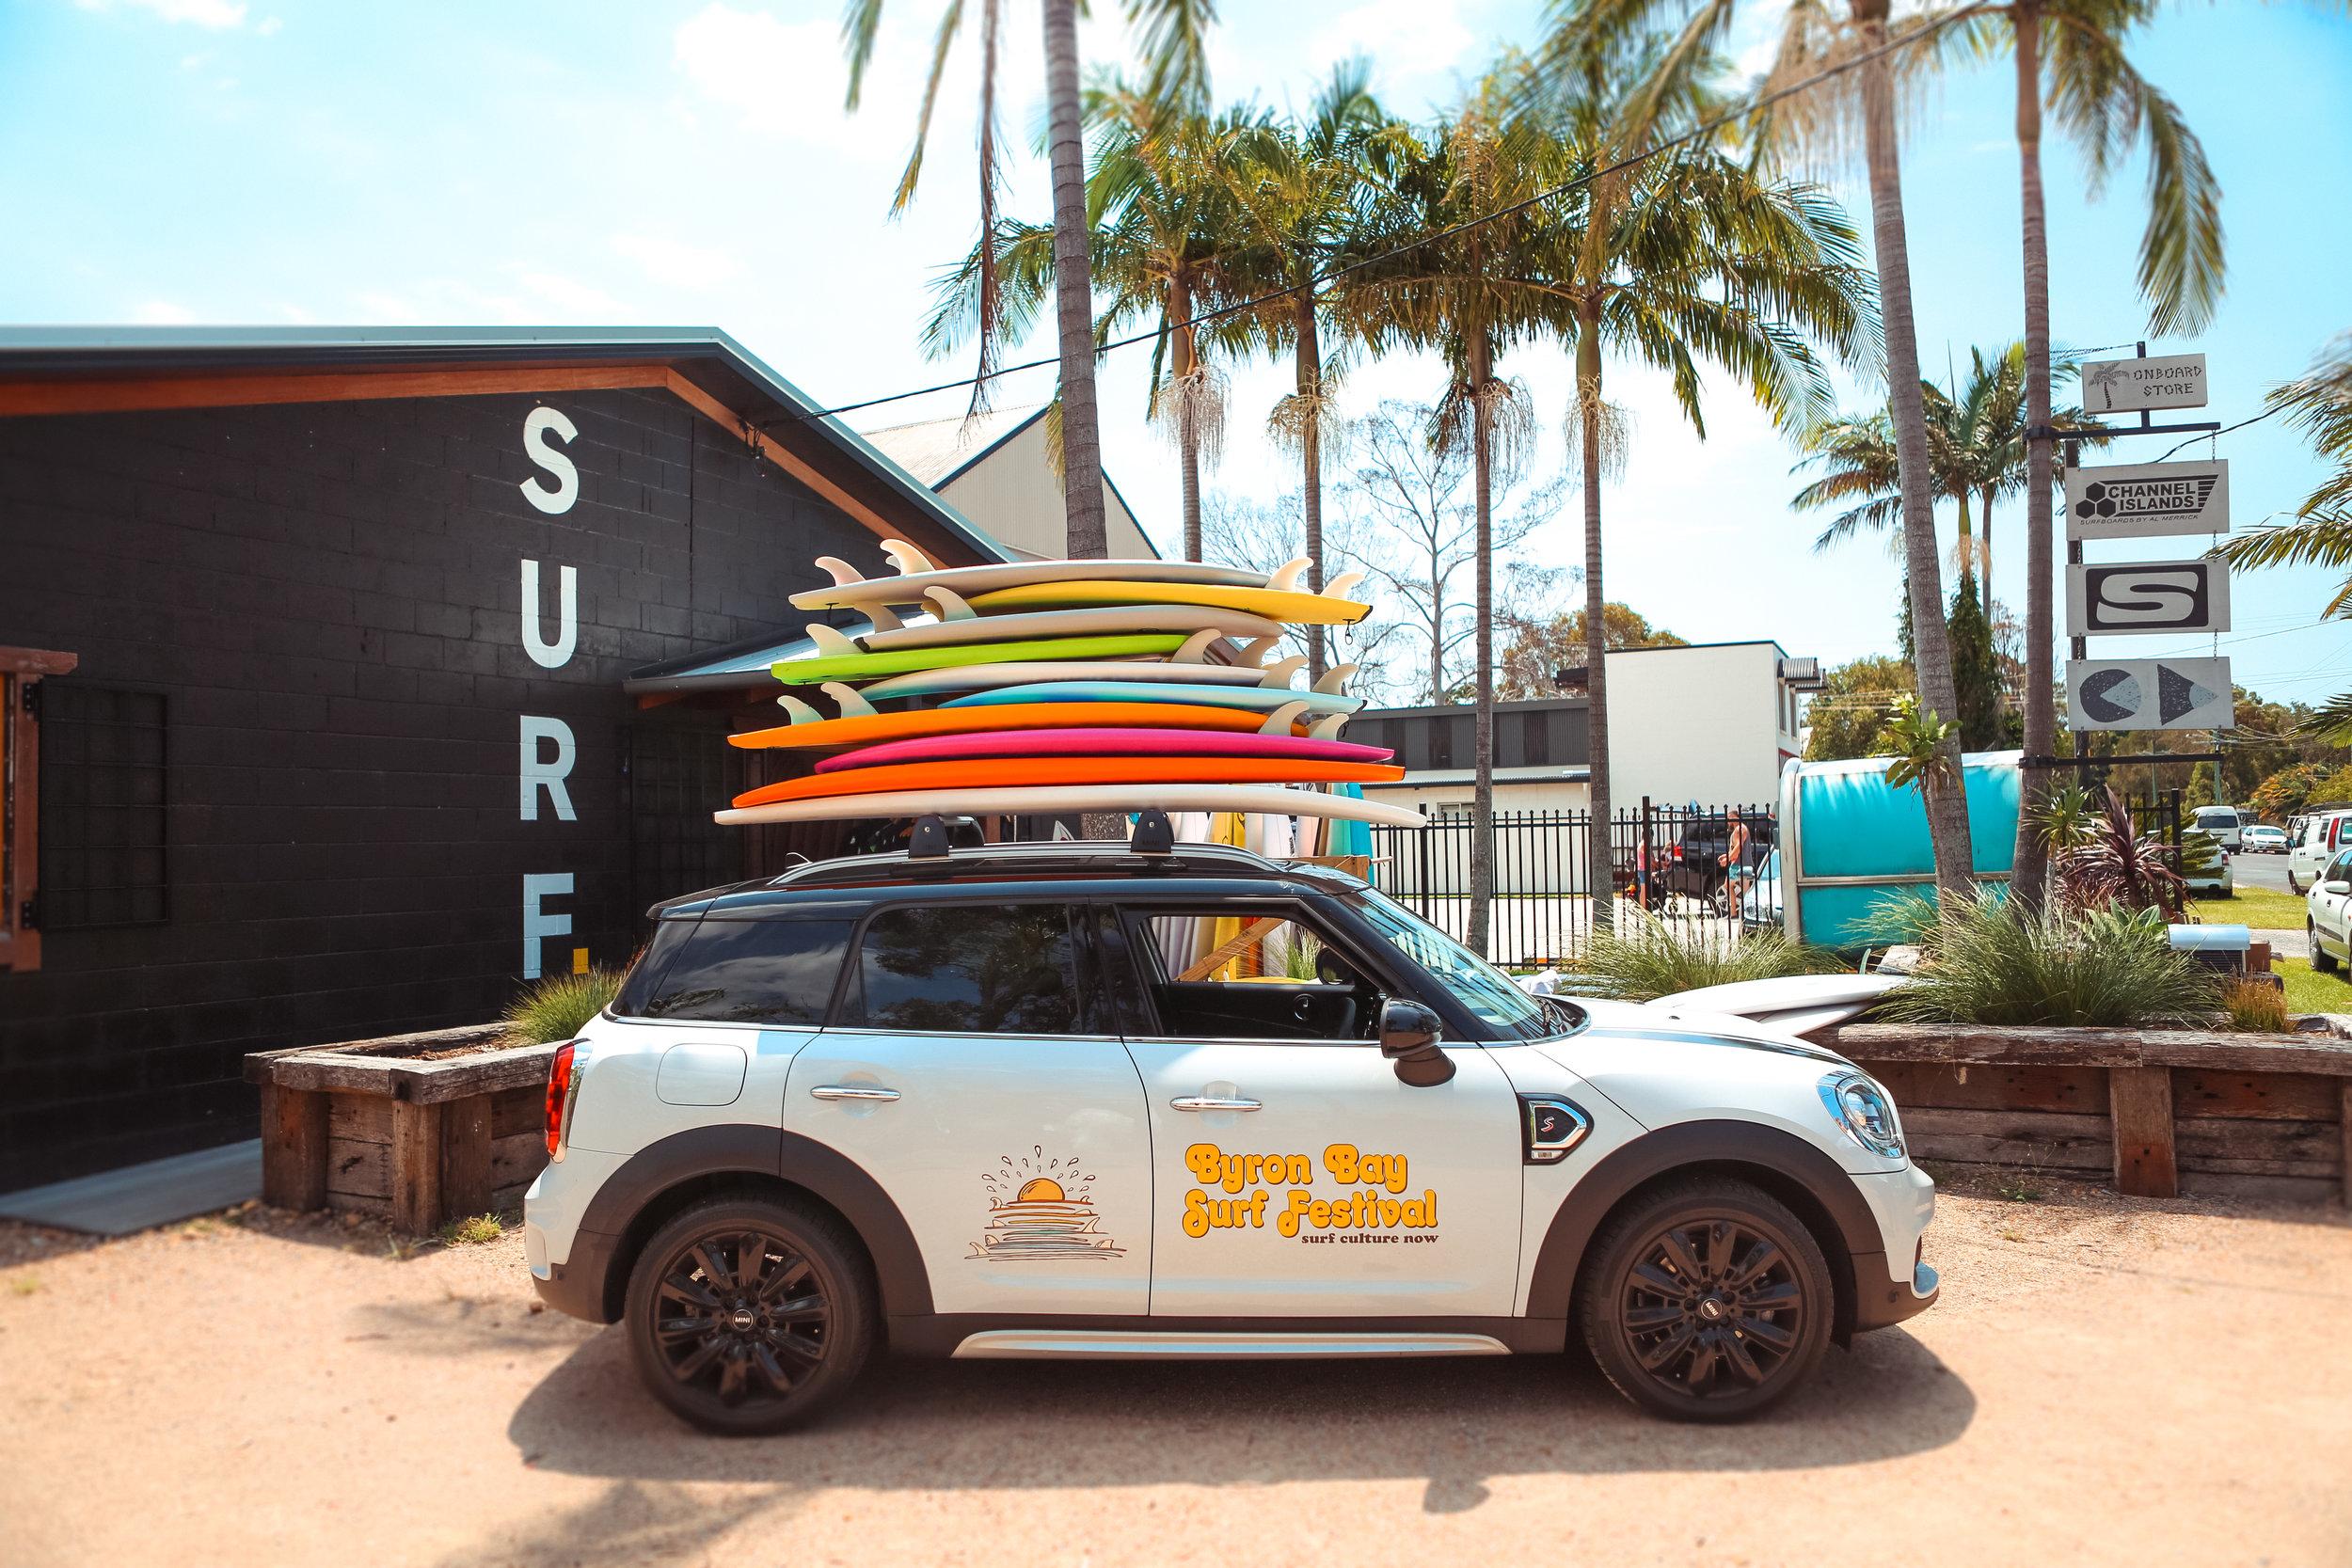 MINI, Catch Surf, Onboard Store. Big ups!! 🙌🏽